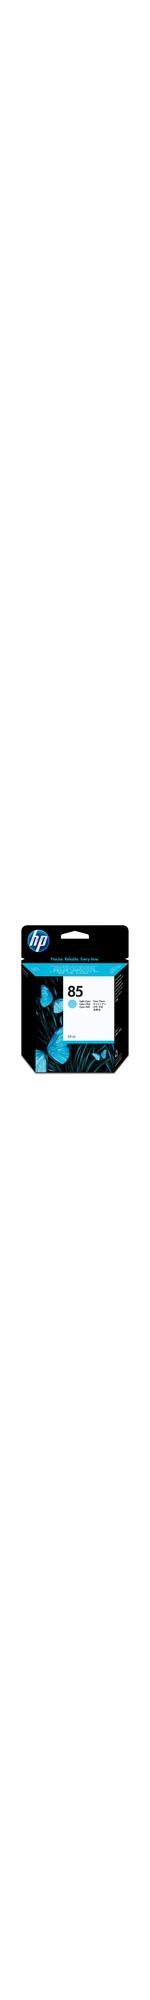 HP No. 85 Ink Cartridge - Light Cyan